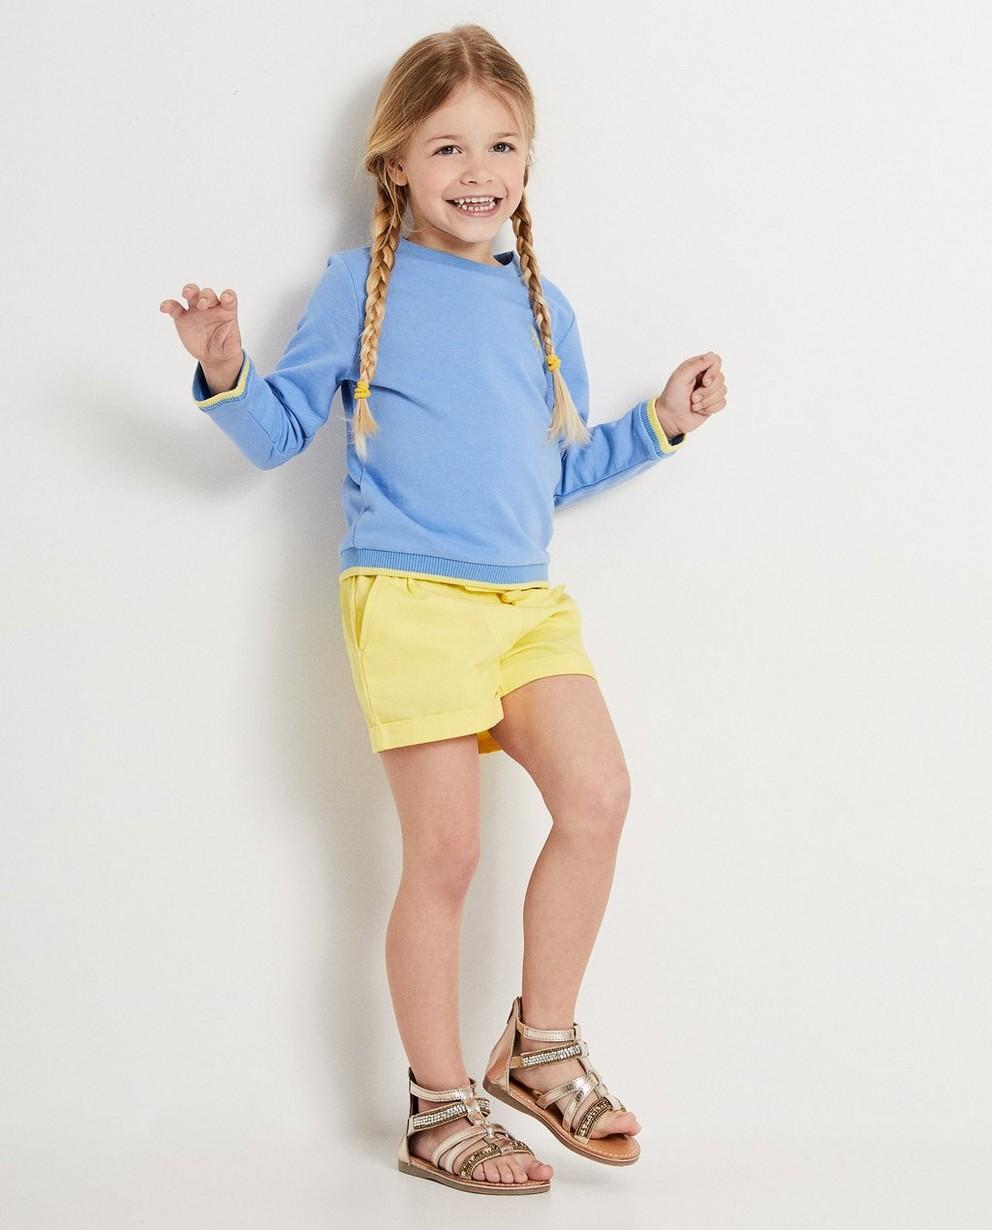 Sweat bleu et jaune, Heidi - avec des accents jaunes - Heidi